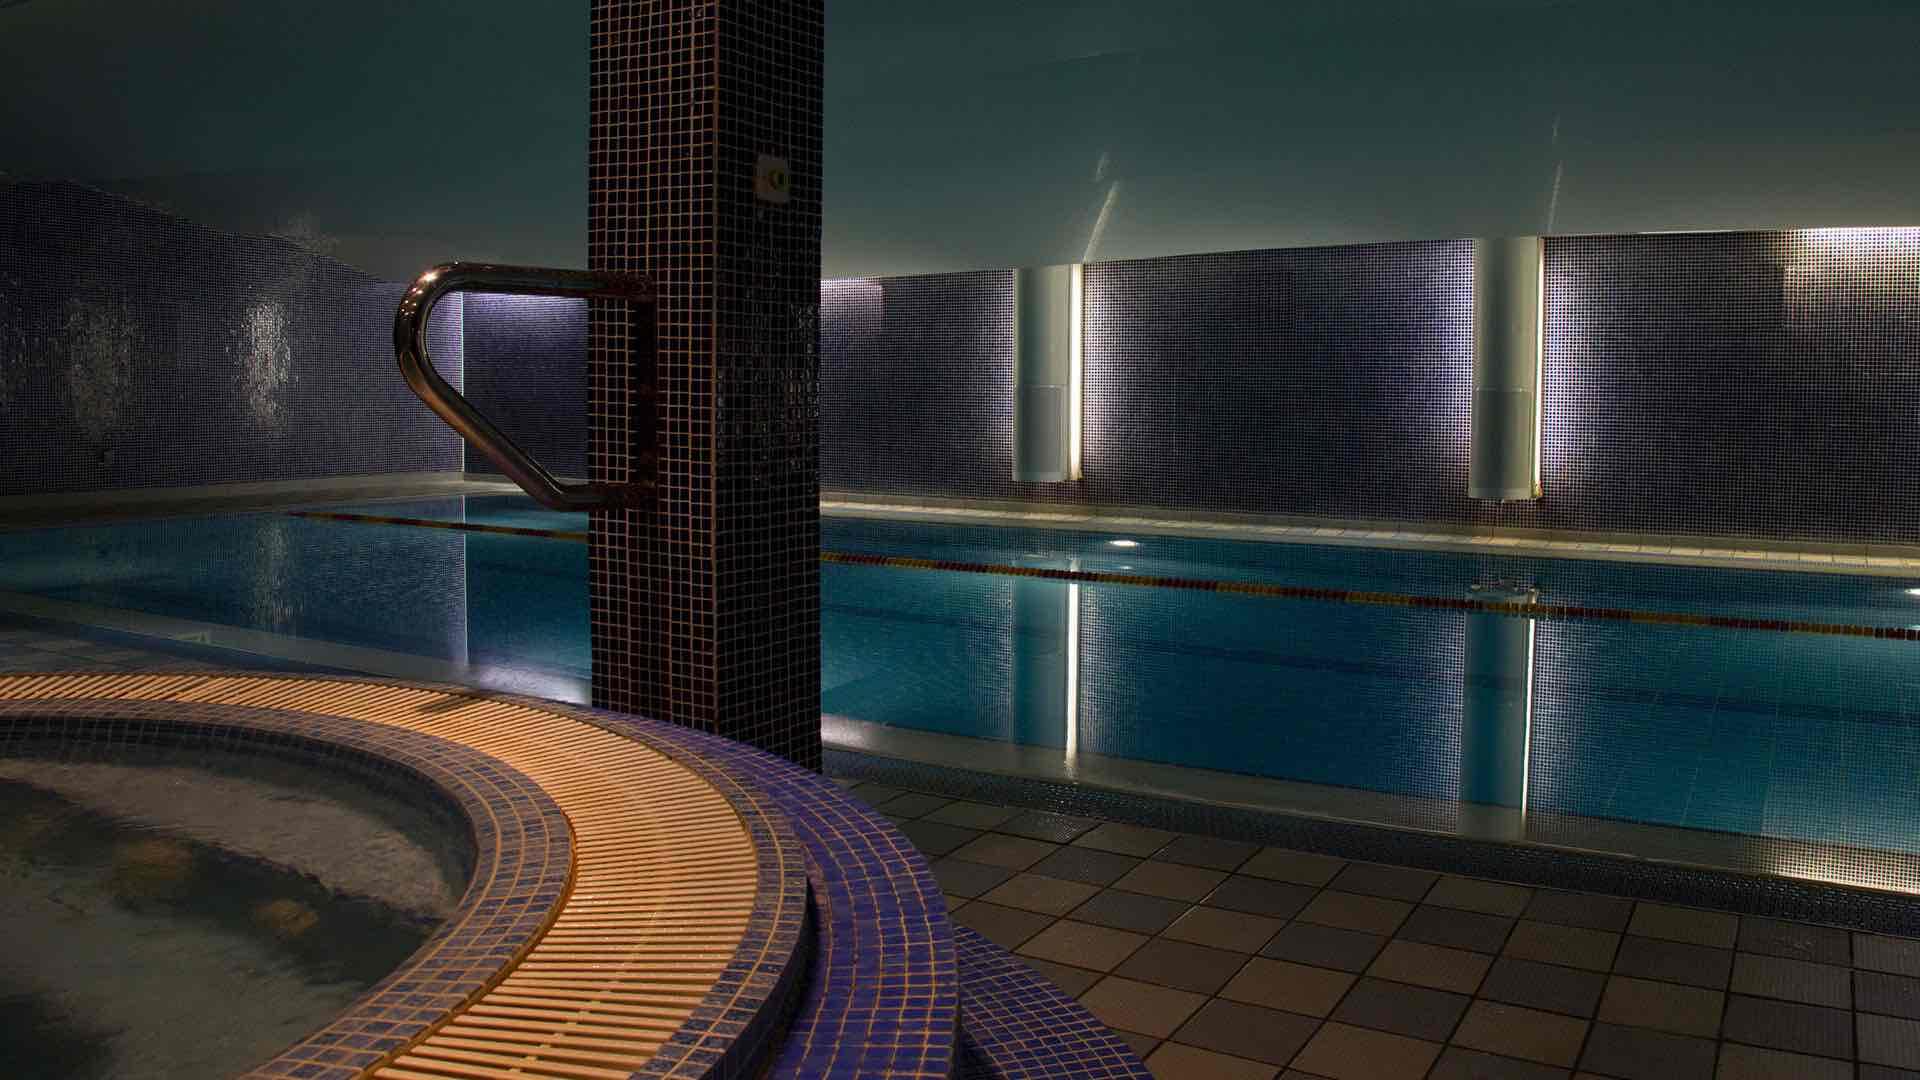 spencer spa -gym-jacuzzi luxury dublin hotel spas interior